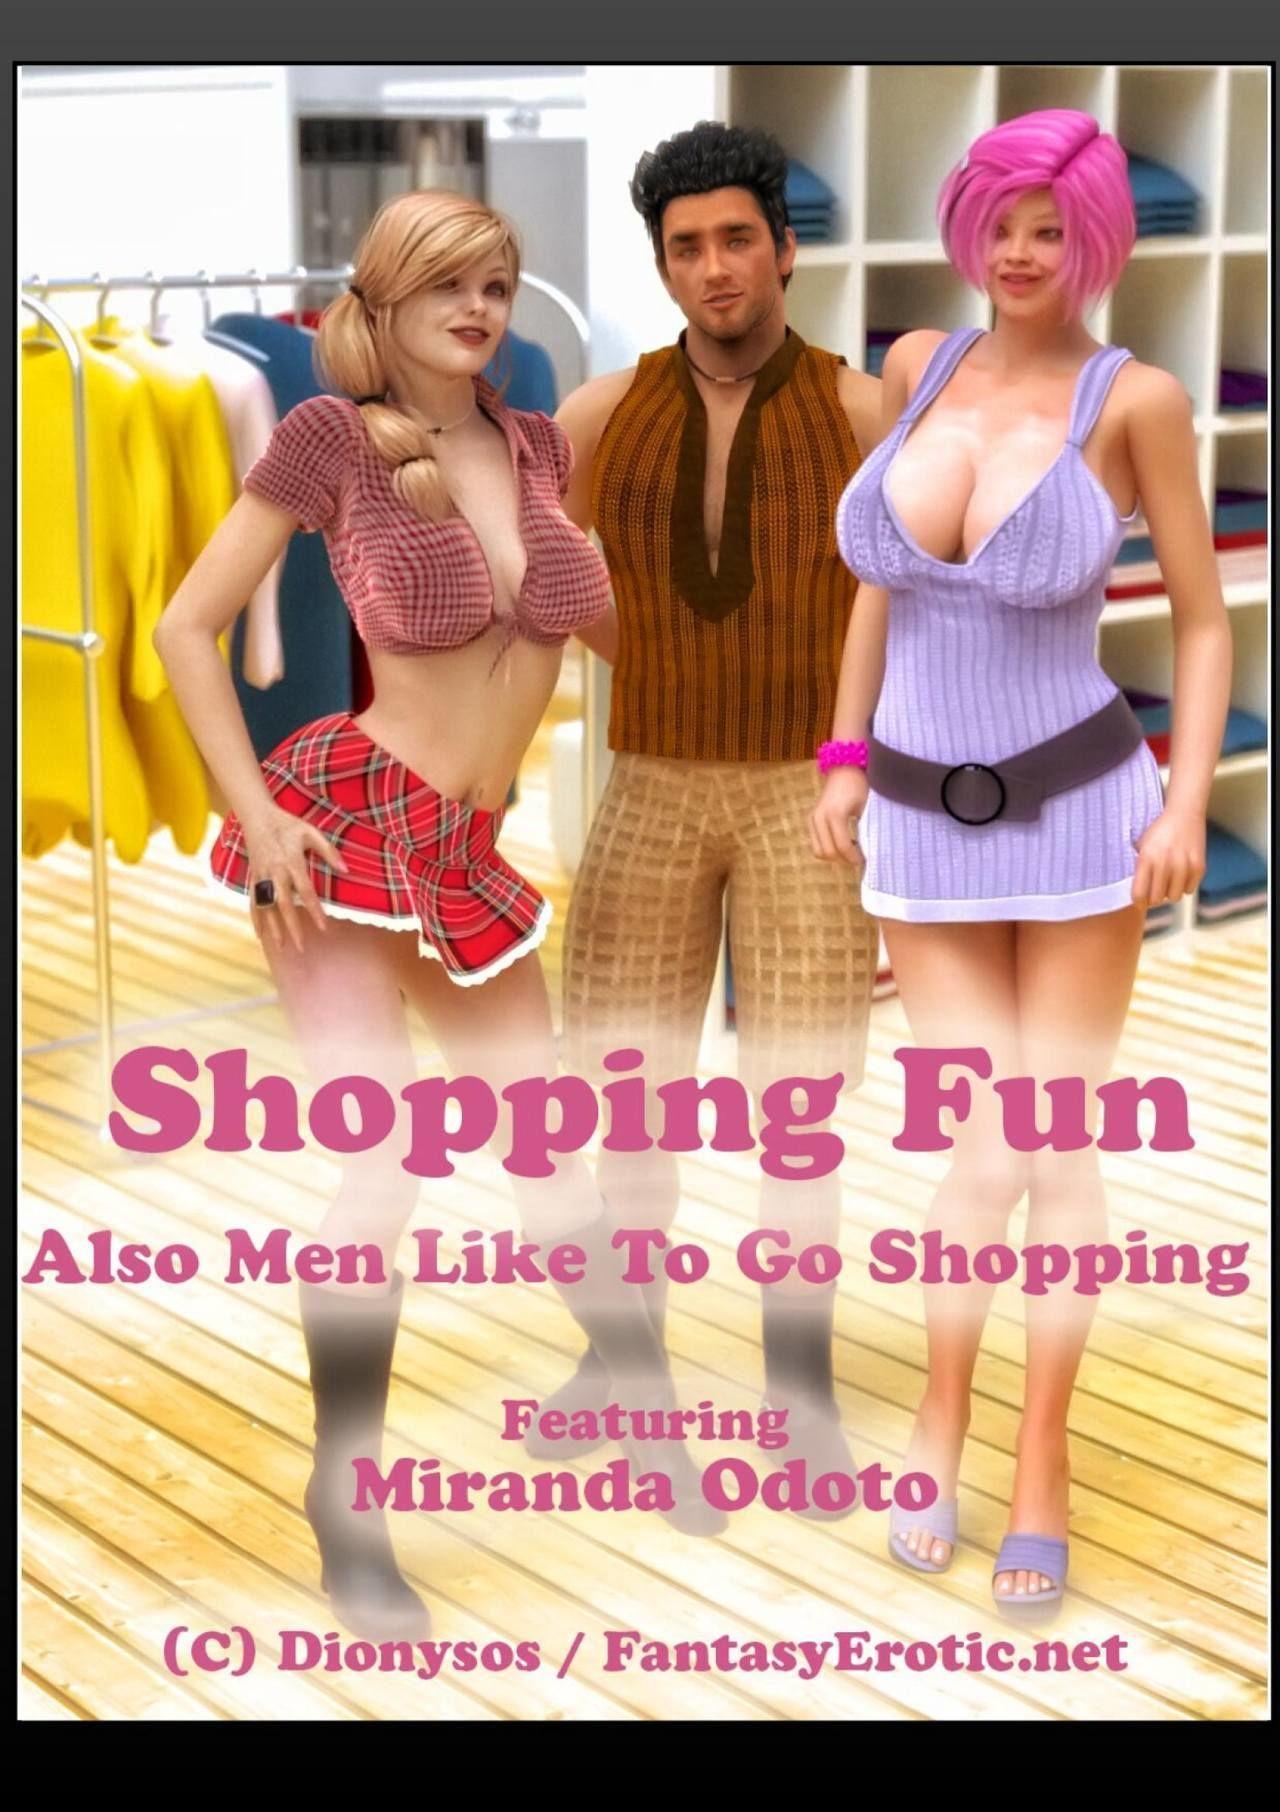 [Dionysos] Shopping Fun